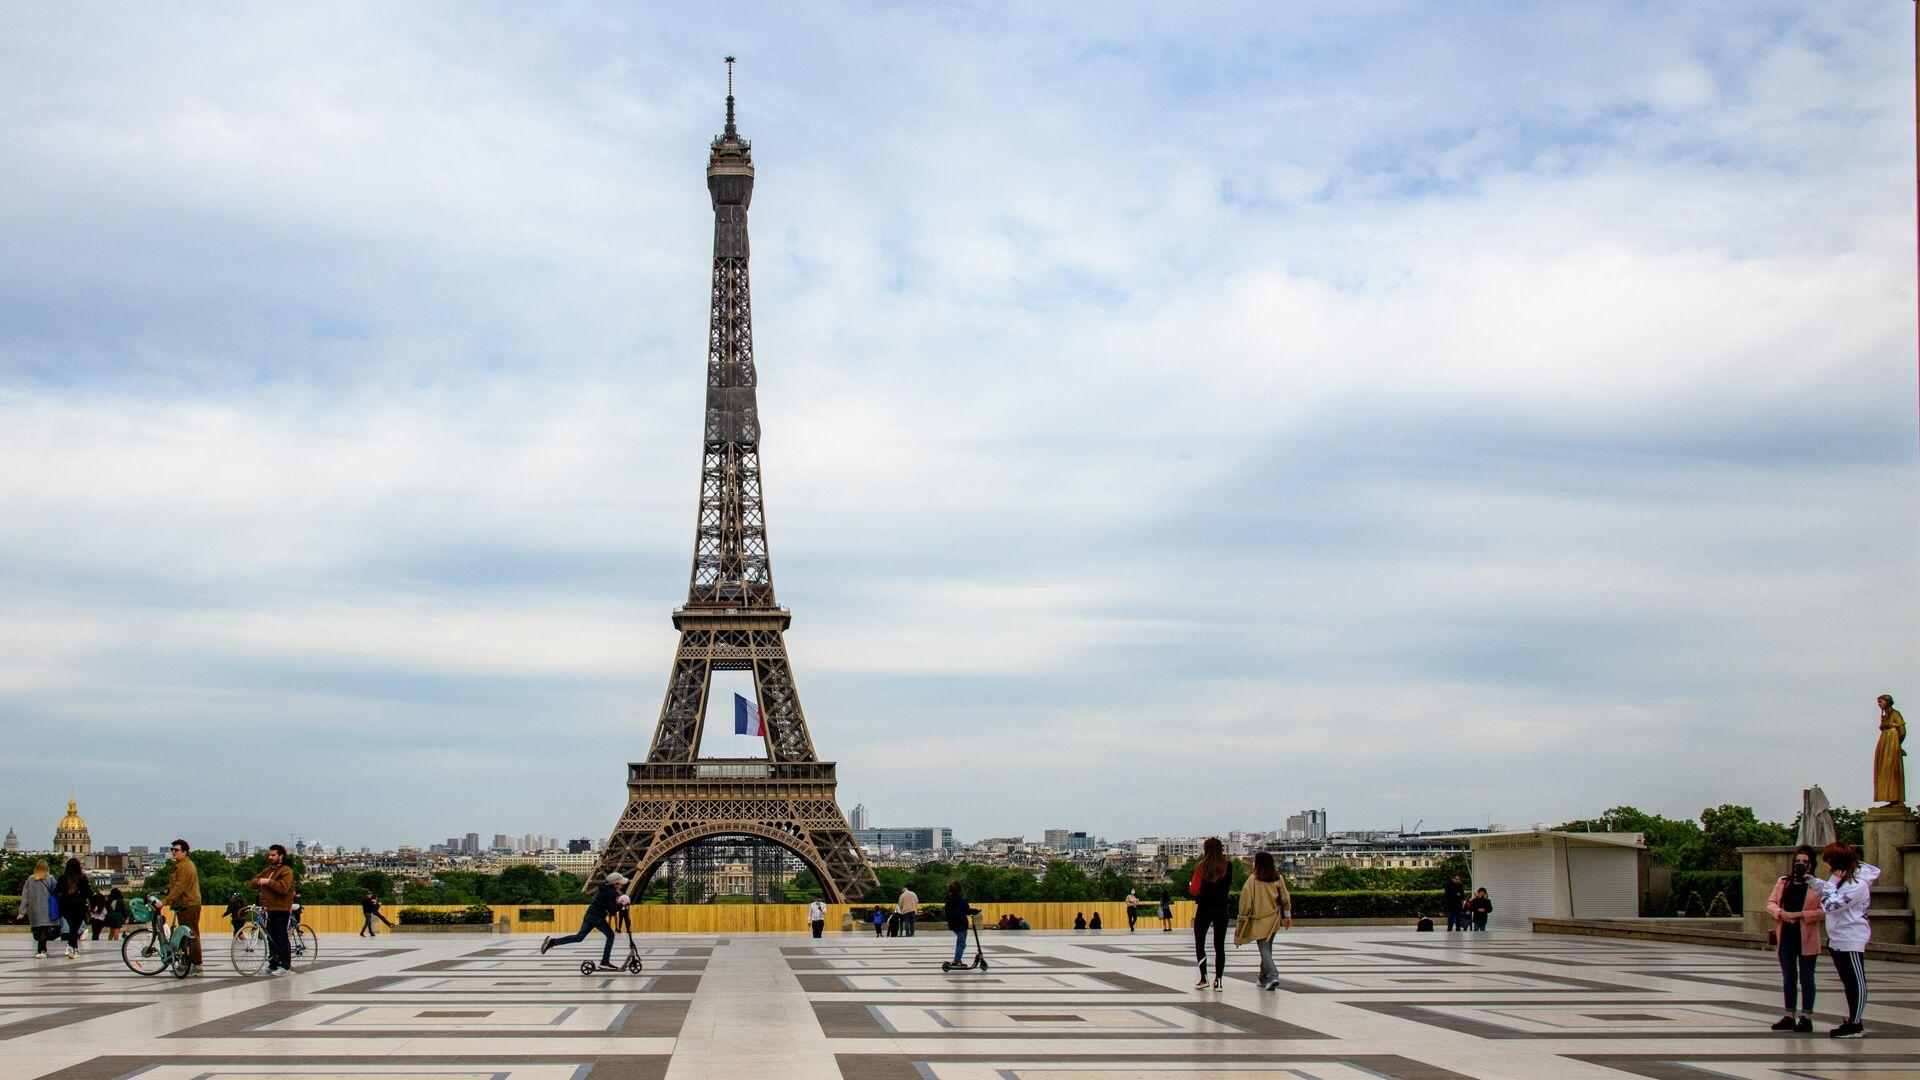 Площадь Трокадеро и Эйфелева башня в Париже - РИА Новости, 1920, 11.09.2020